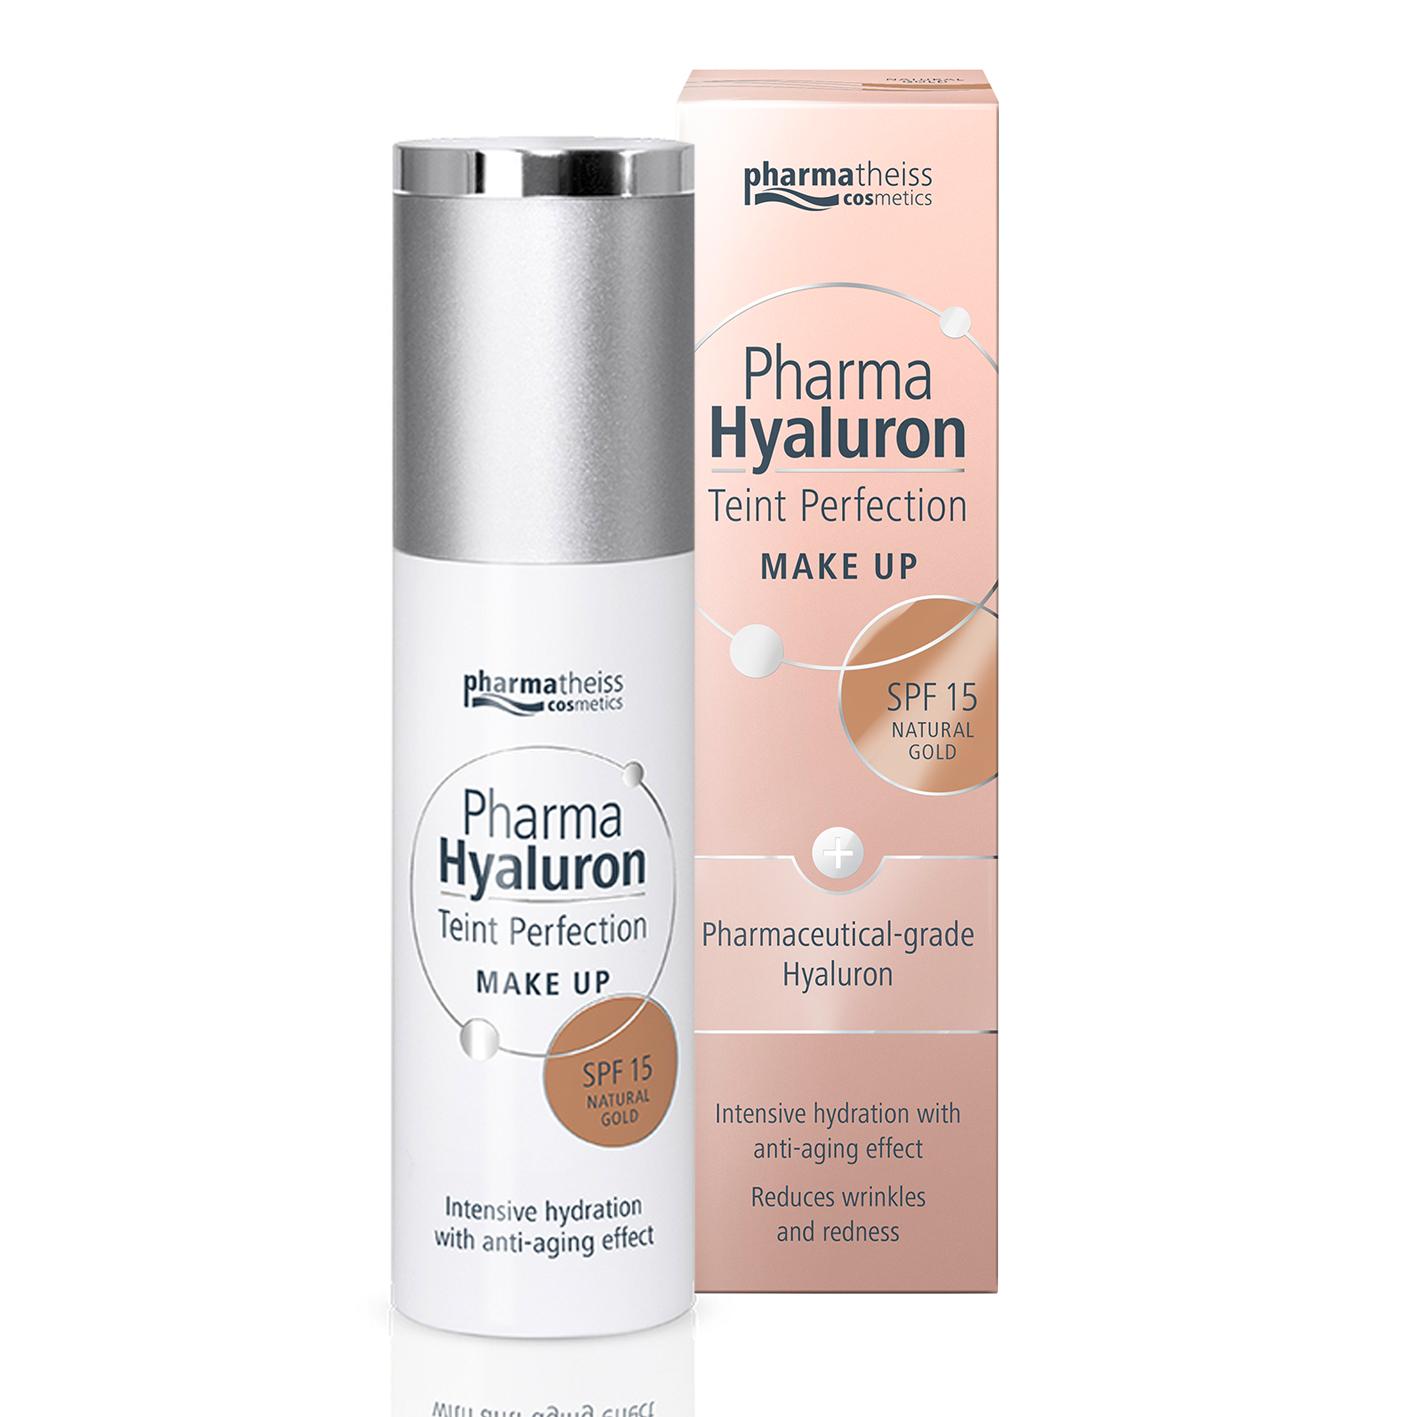 make-up-pharma-hyaluron-SPF-natural-gold